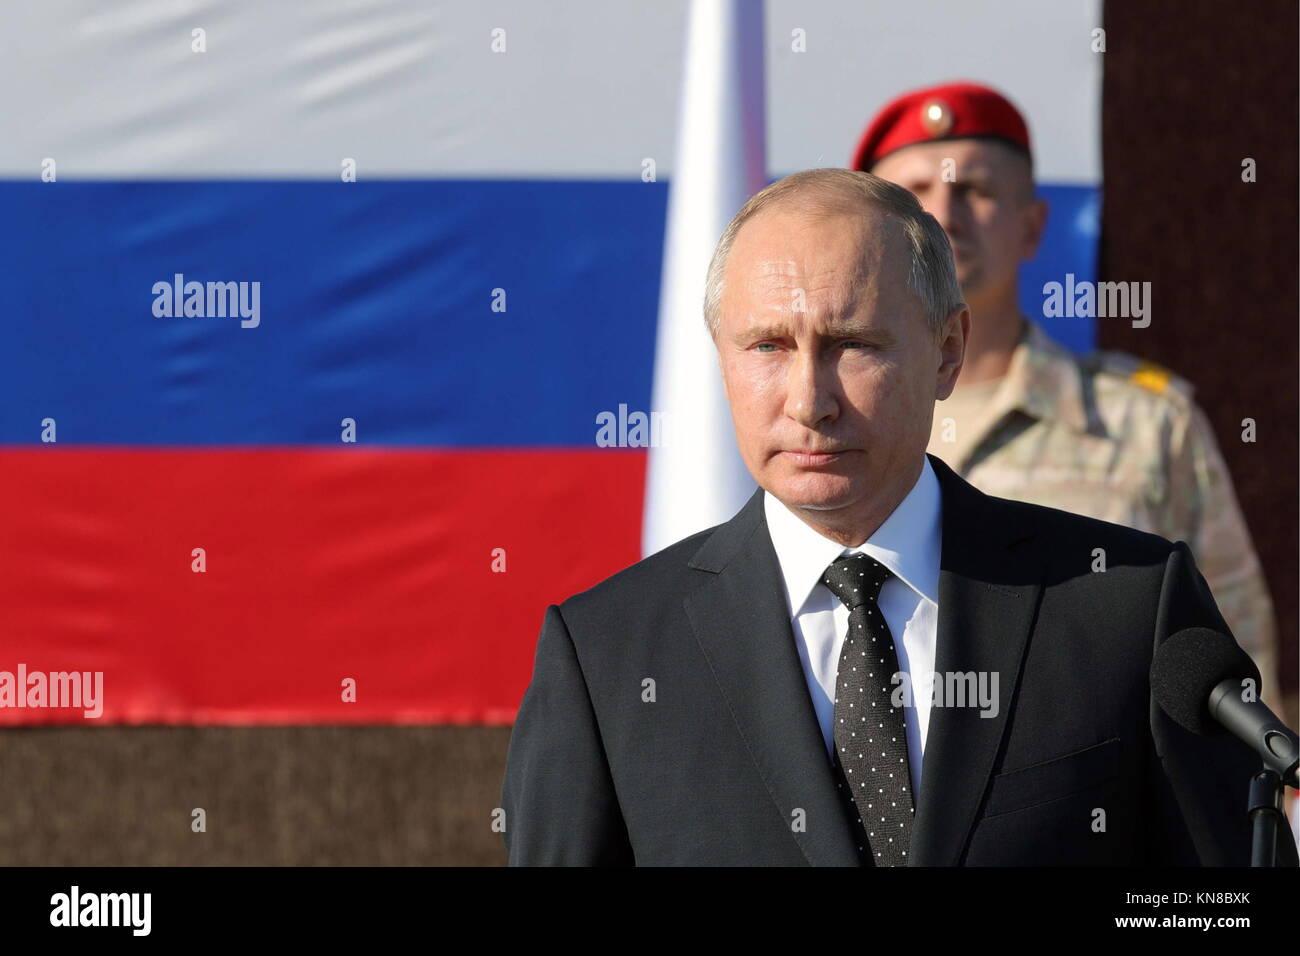 Latakia, Syria. 11th Dec, 2017. Russia's President Vladimir Putin (front) at the Russian Hmeimim air base. Putin - Stock Image